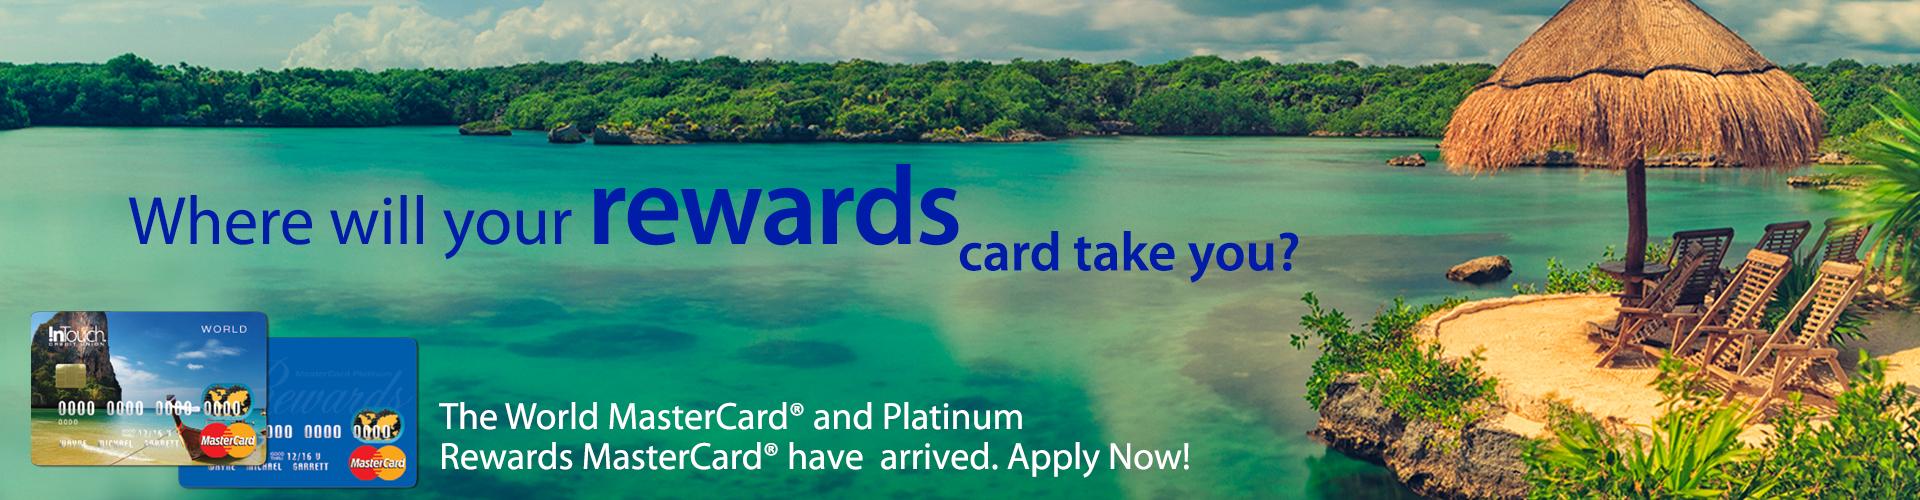 Rpf4cabbr9sohzcx9gqe+creditcardsintro_beach